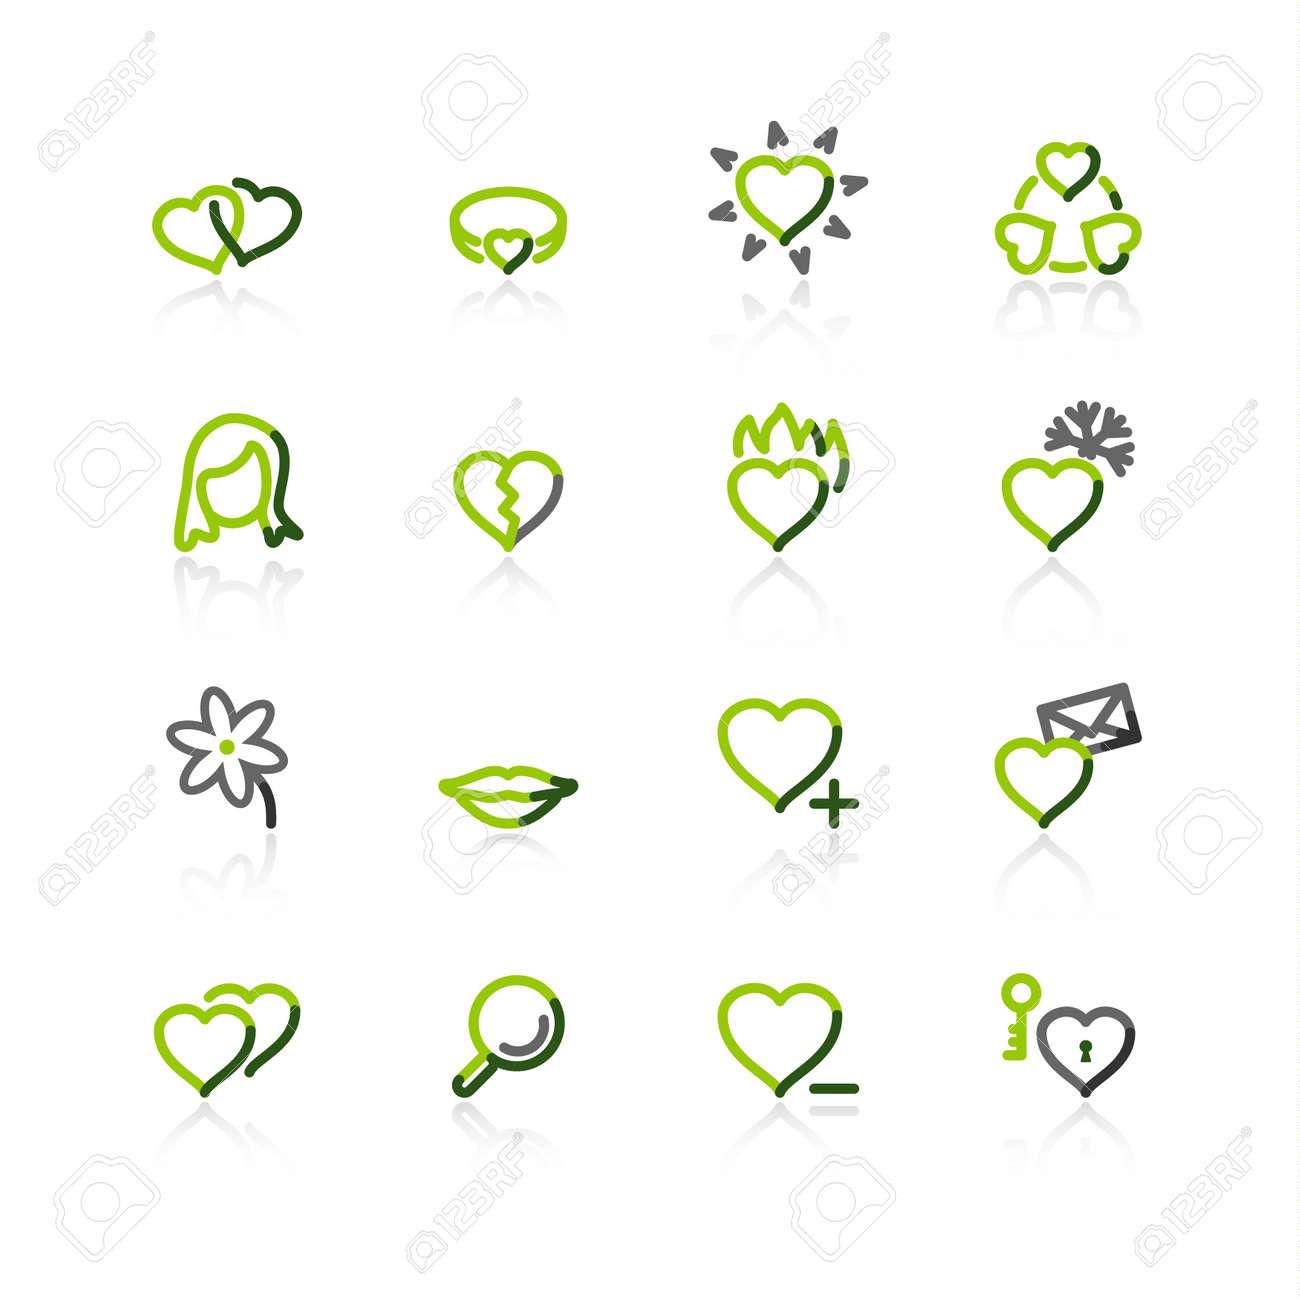 green-gray love icons Stock Vector - 3644573